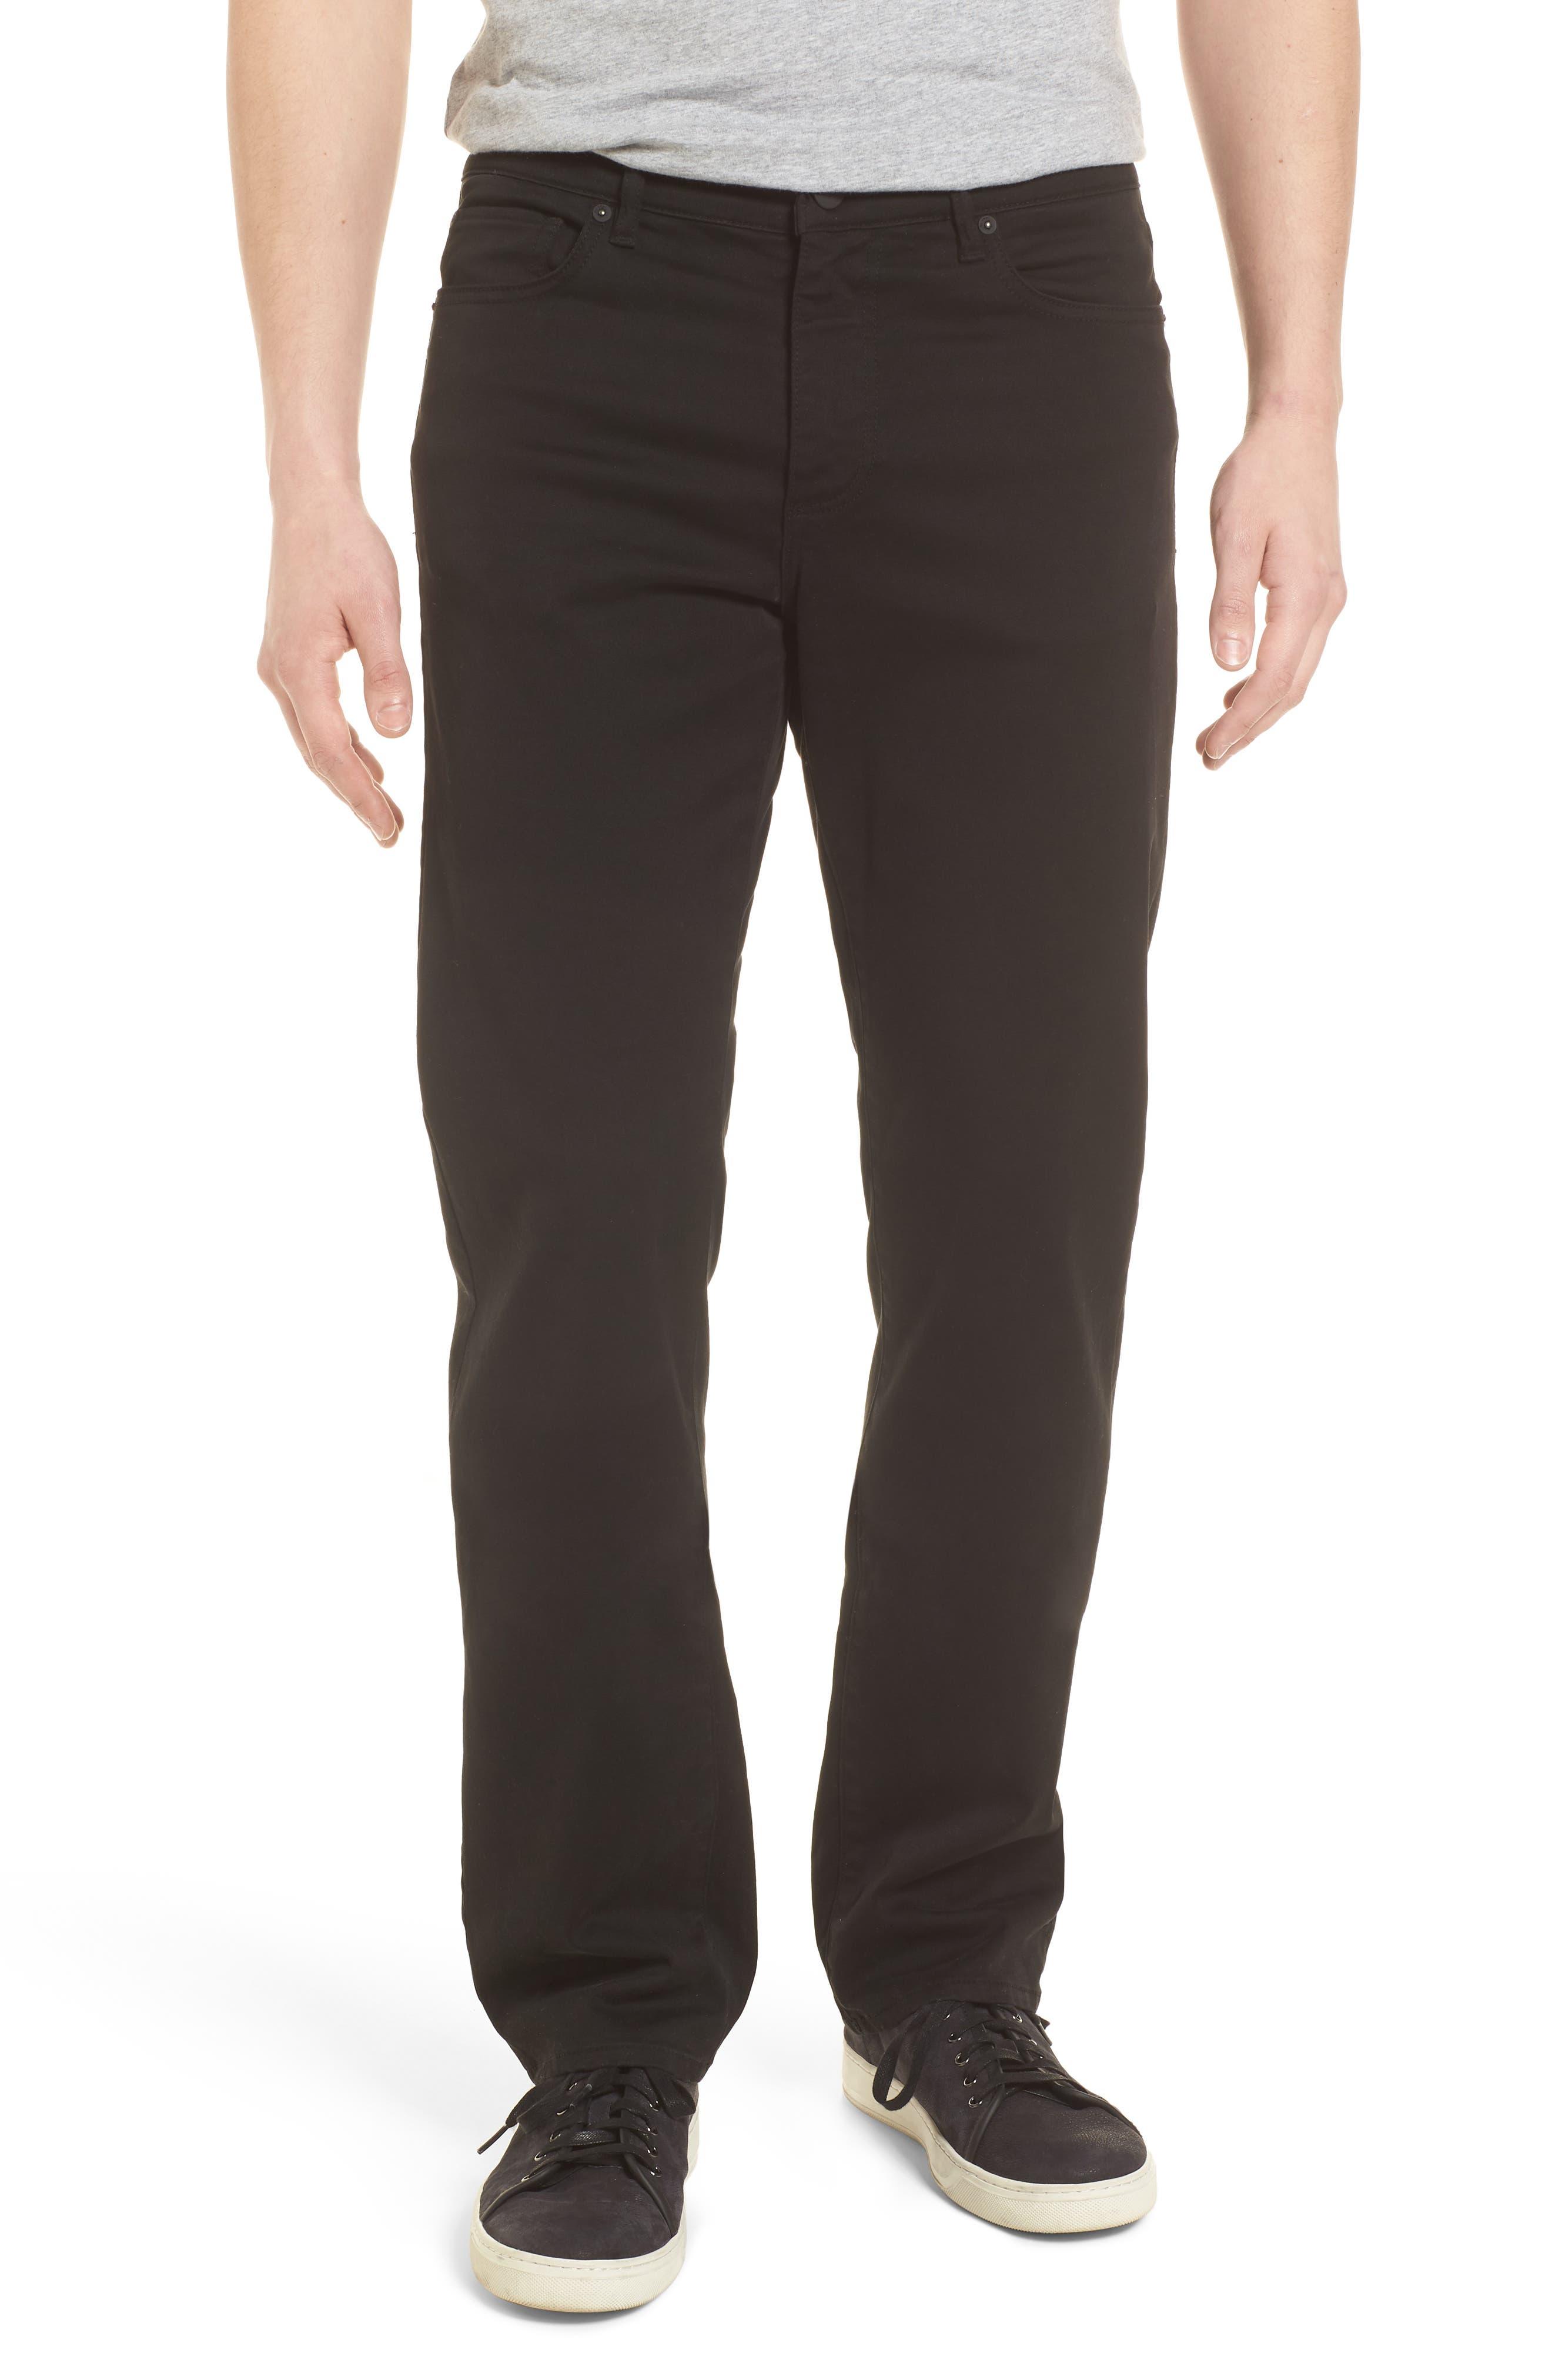 Avery Slim Straight Chino Pants,                         Main,                         color, COAL